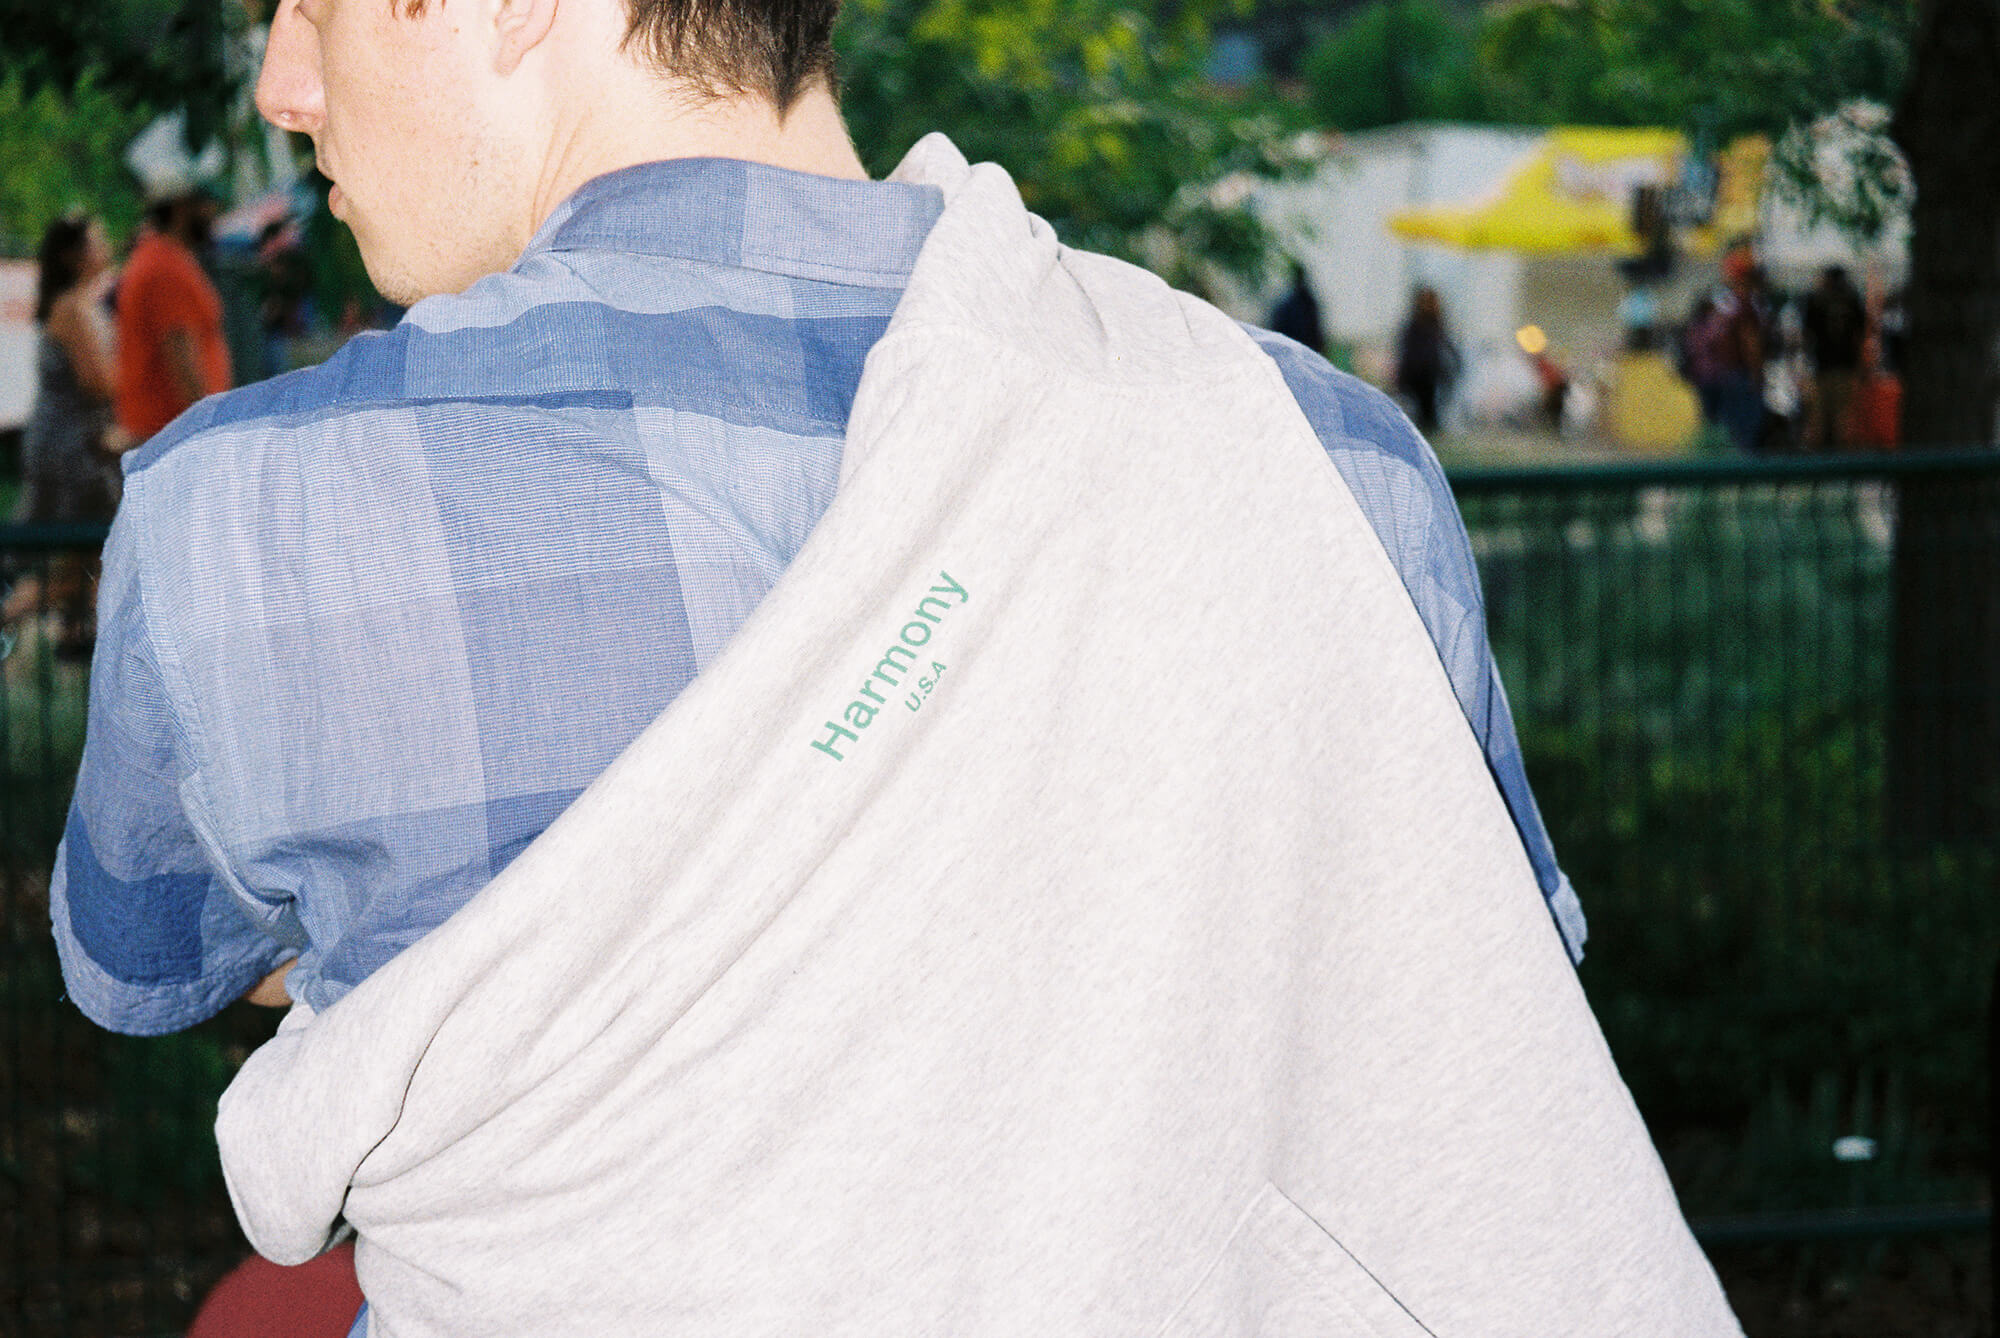 harmony paris clothing on body 3